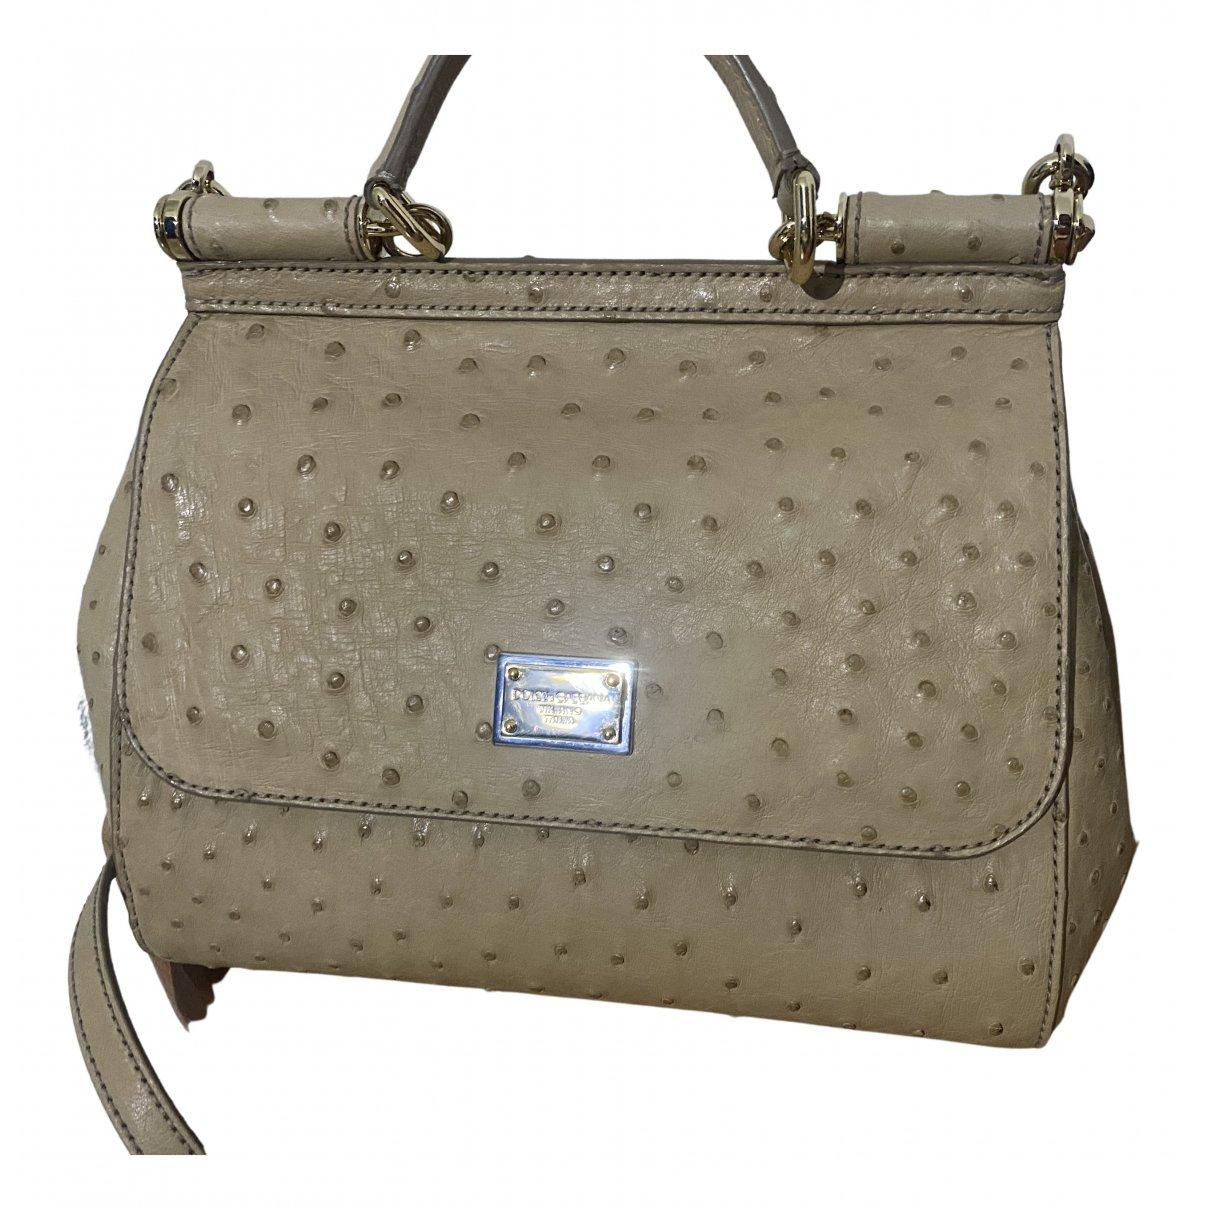 Dolce & Gabbana Sicily Camel Ostrich Handbag for Women